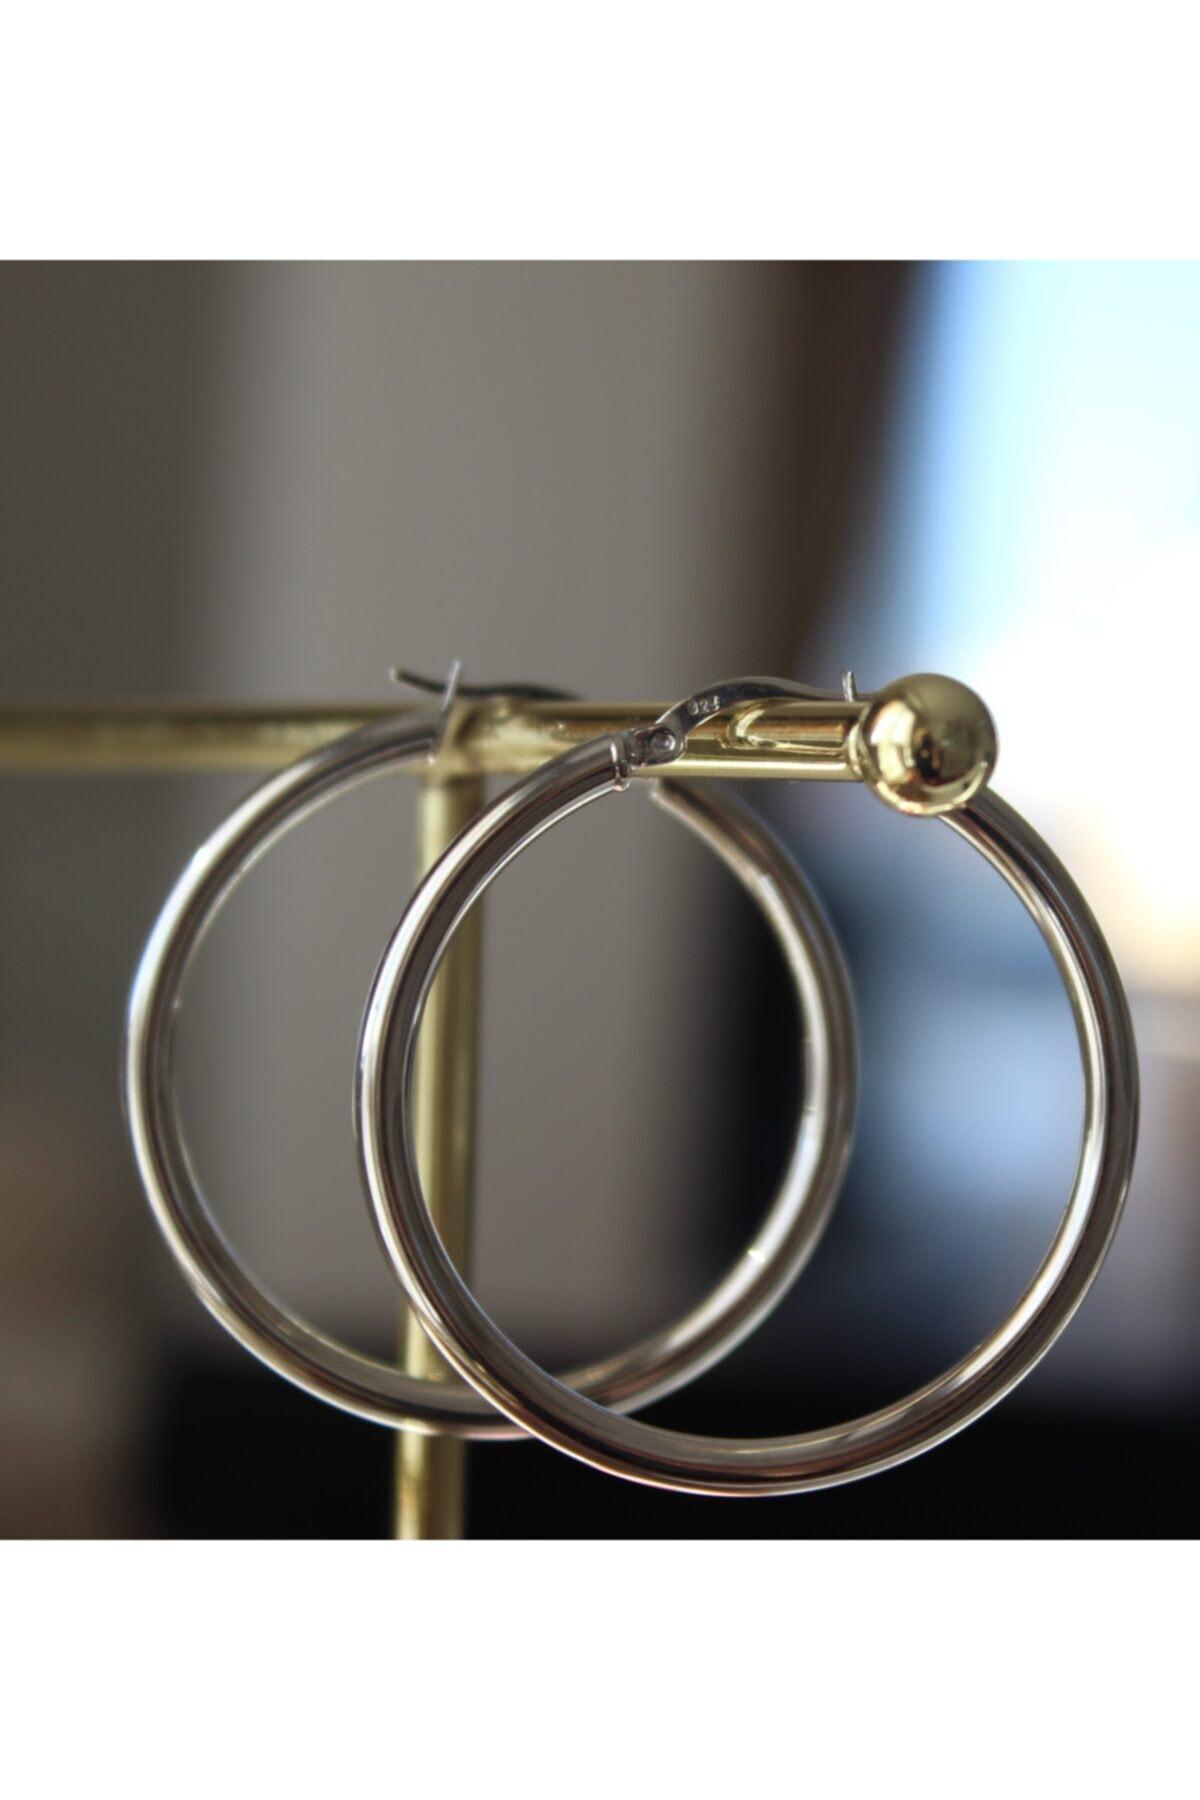 MODERN JEWELS DESIGN 925 Ayar Gümüş Rodyum Kaplama Halka Küpe 1